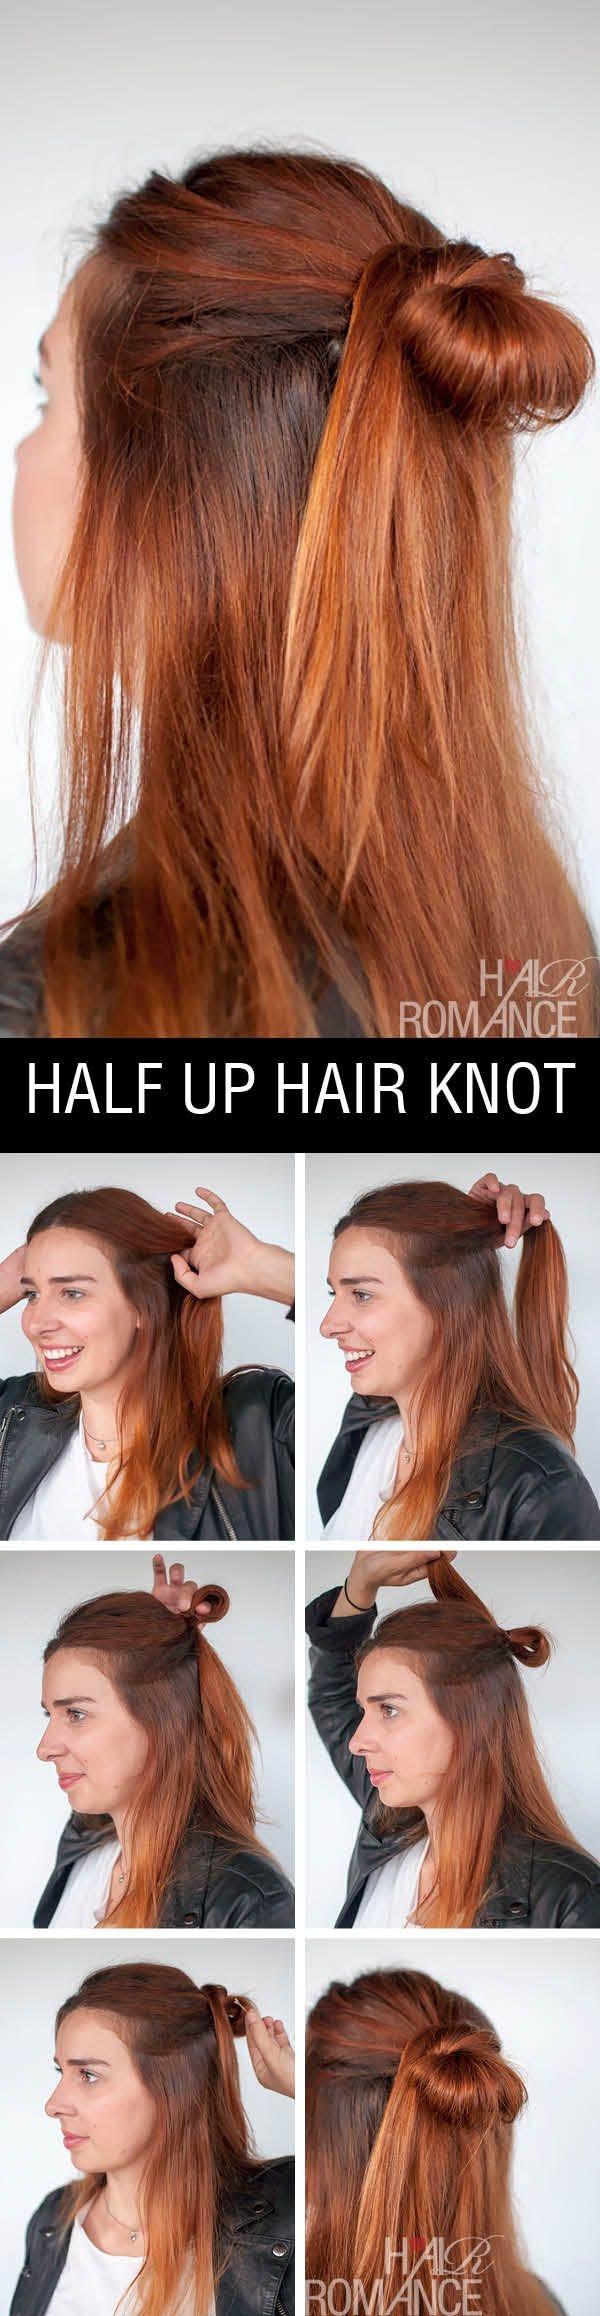 22 Half Up Half Down Hairstyles Easy Step By Step Hair